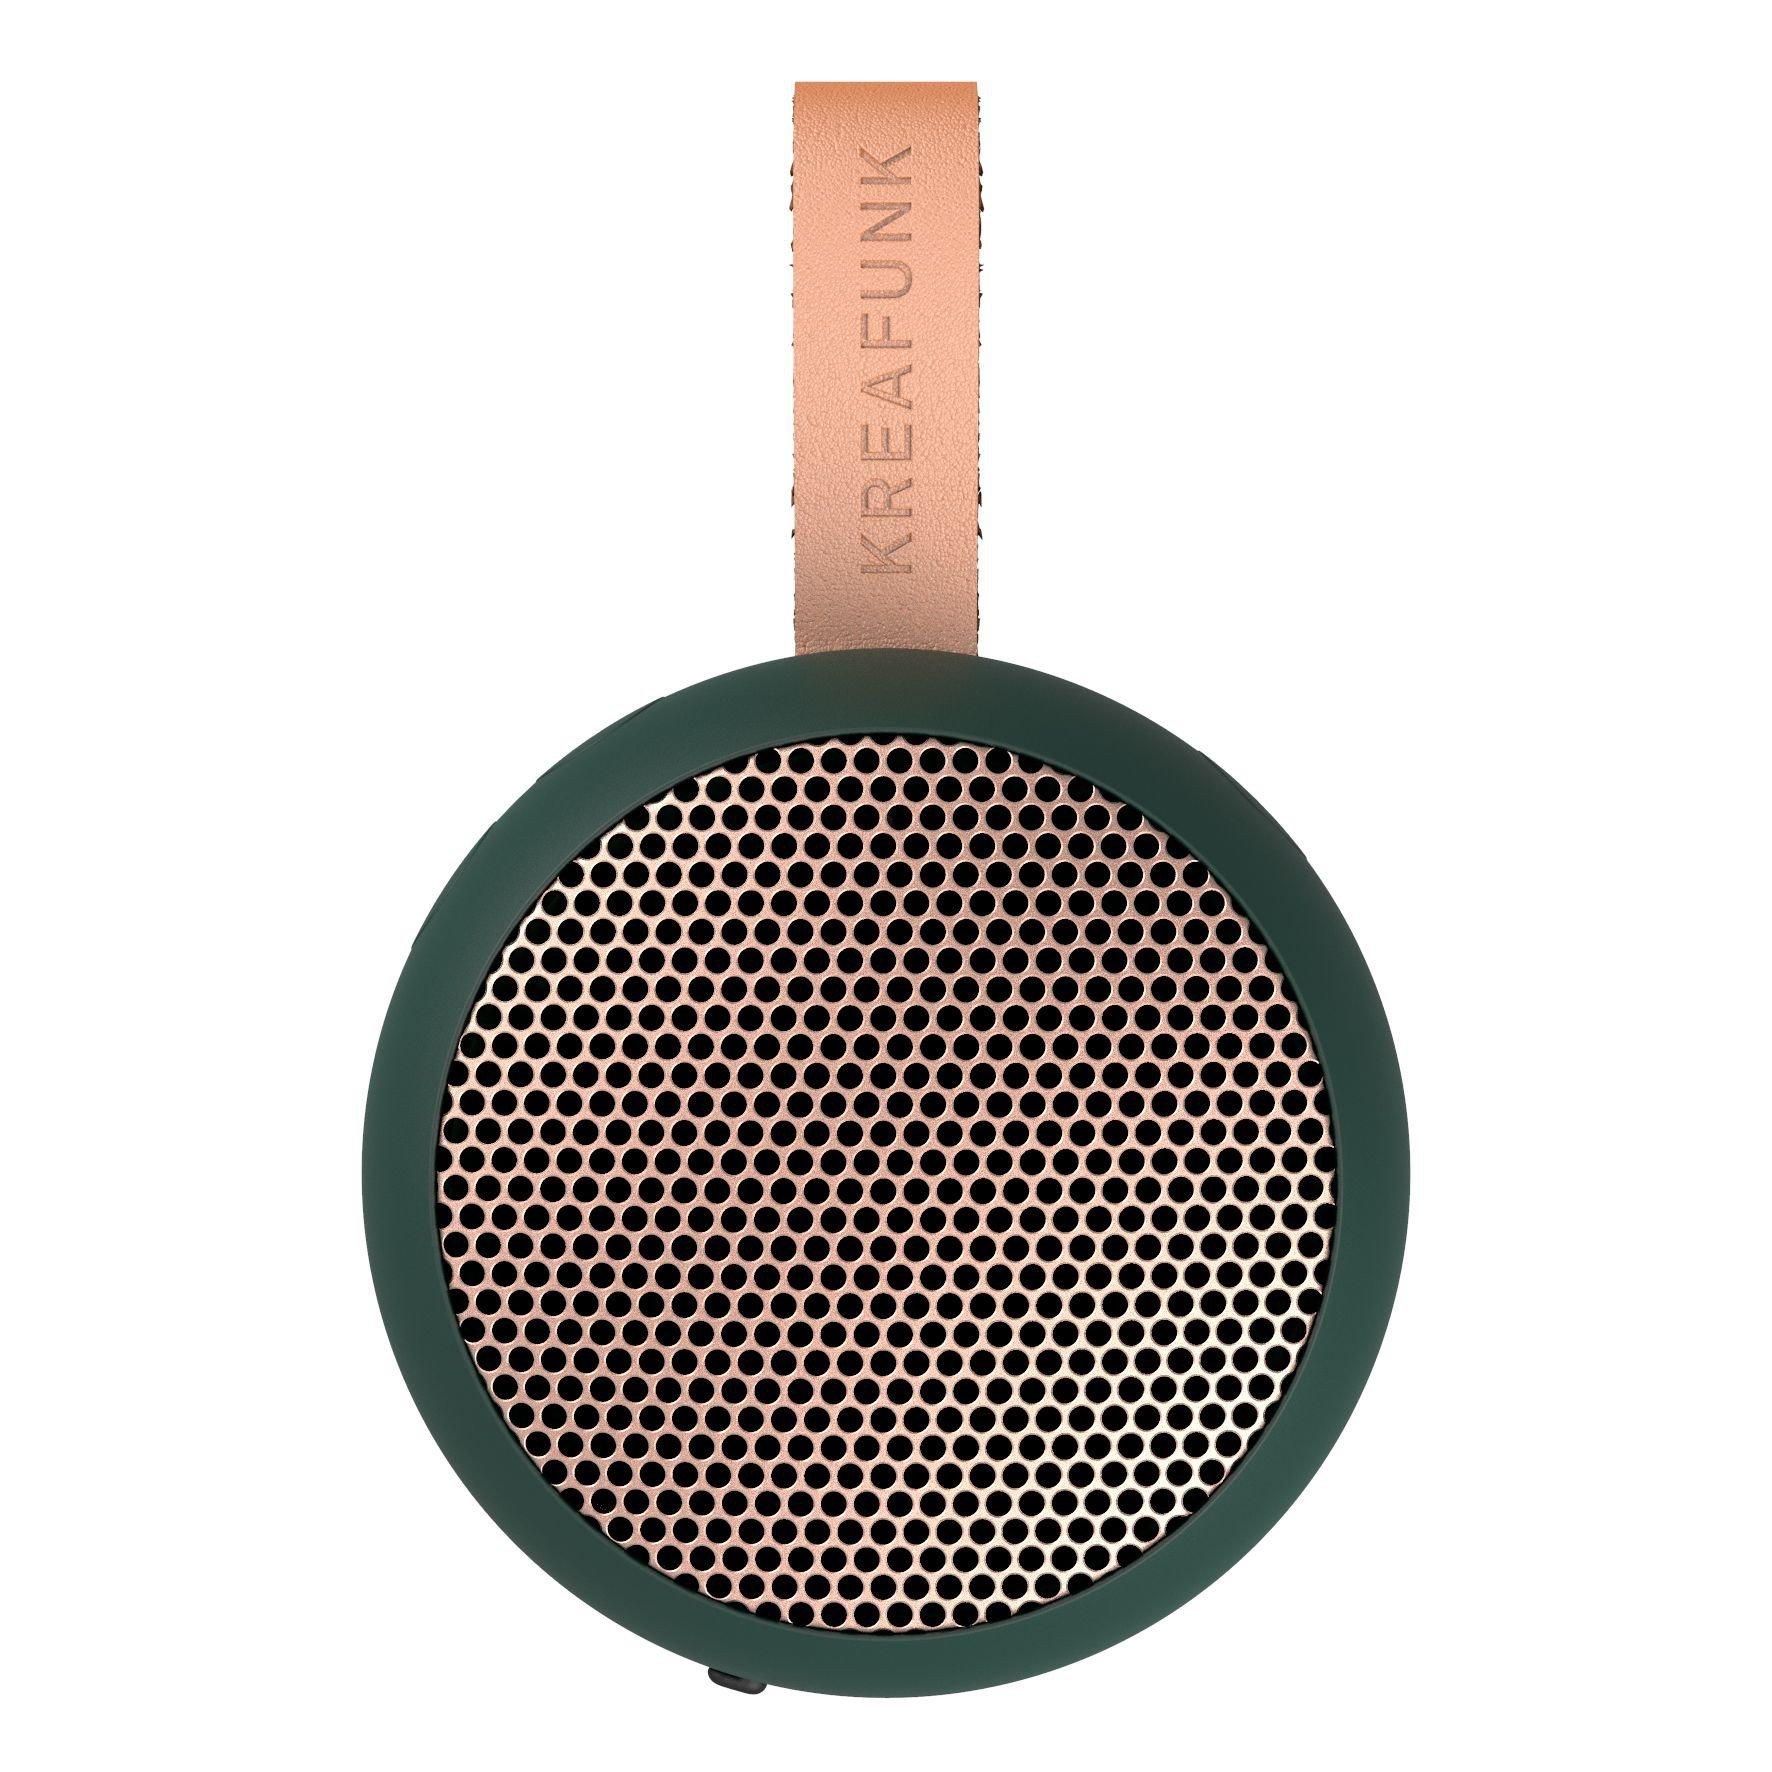 KreaFunk - aGO Bluetooth Speaker - Shady Green/Rose Gold Grill (Kfwt38)